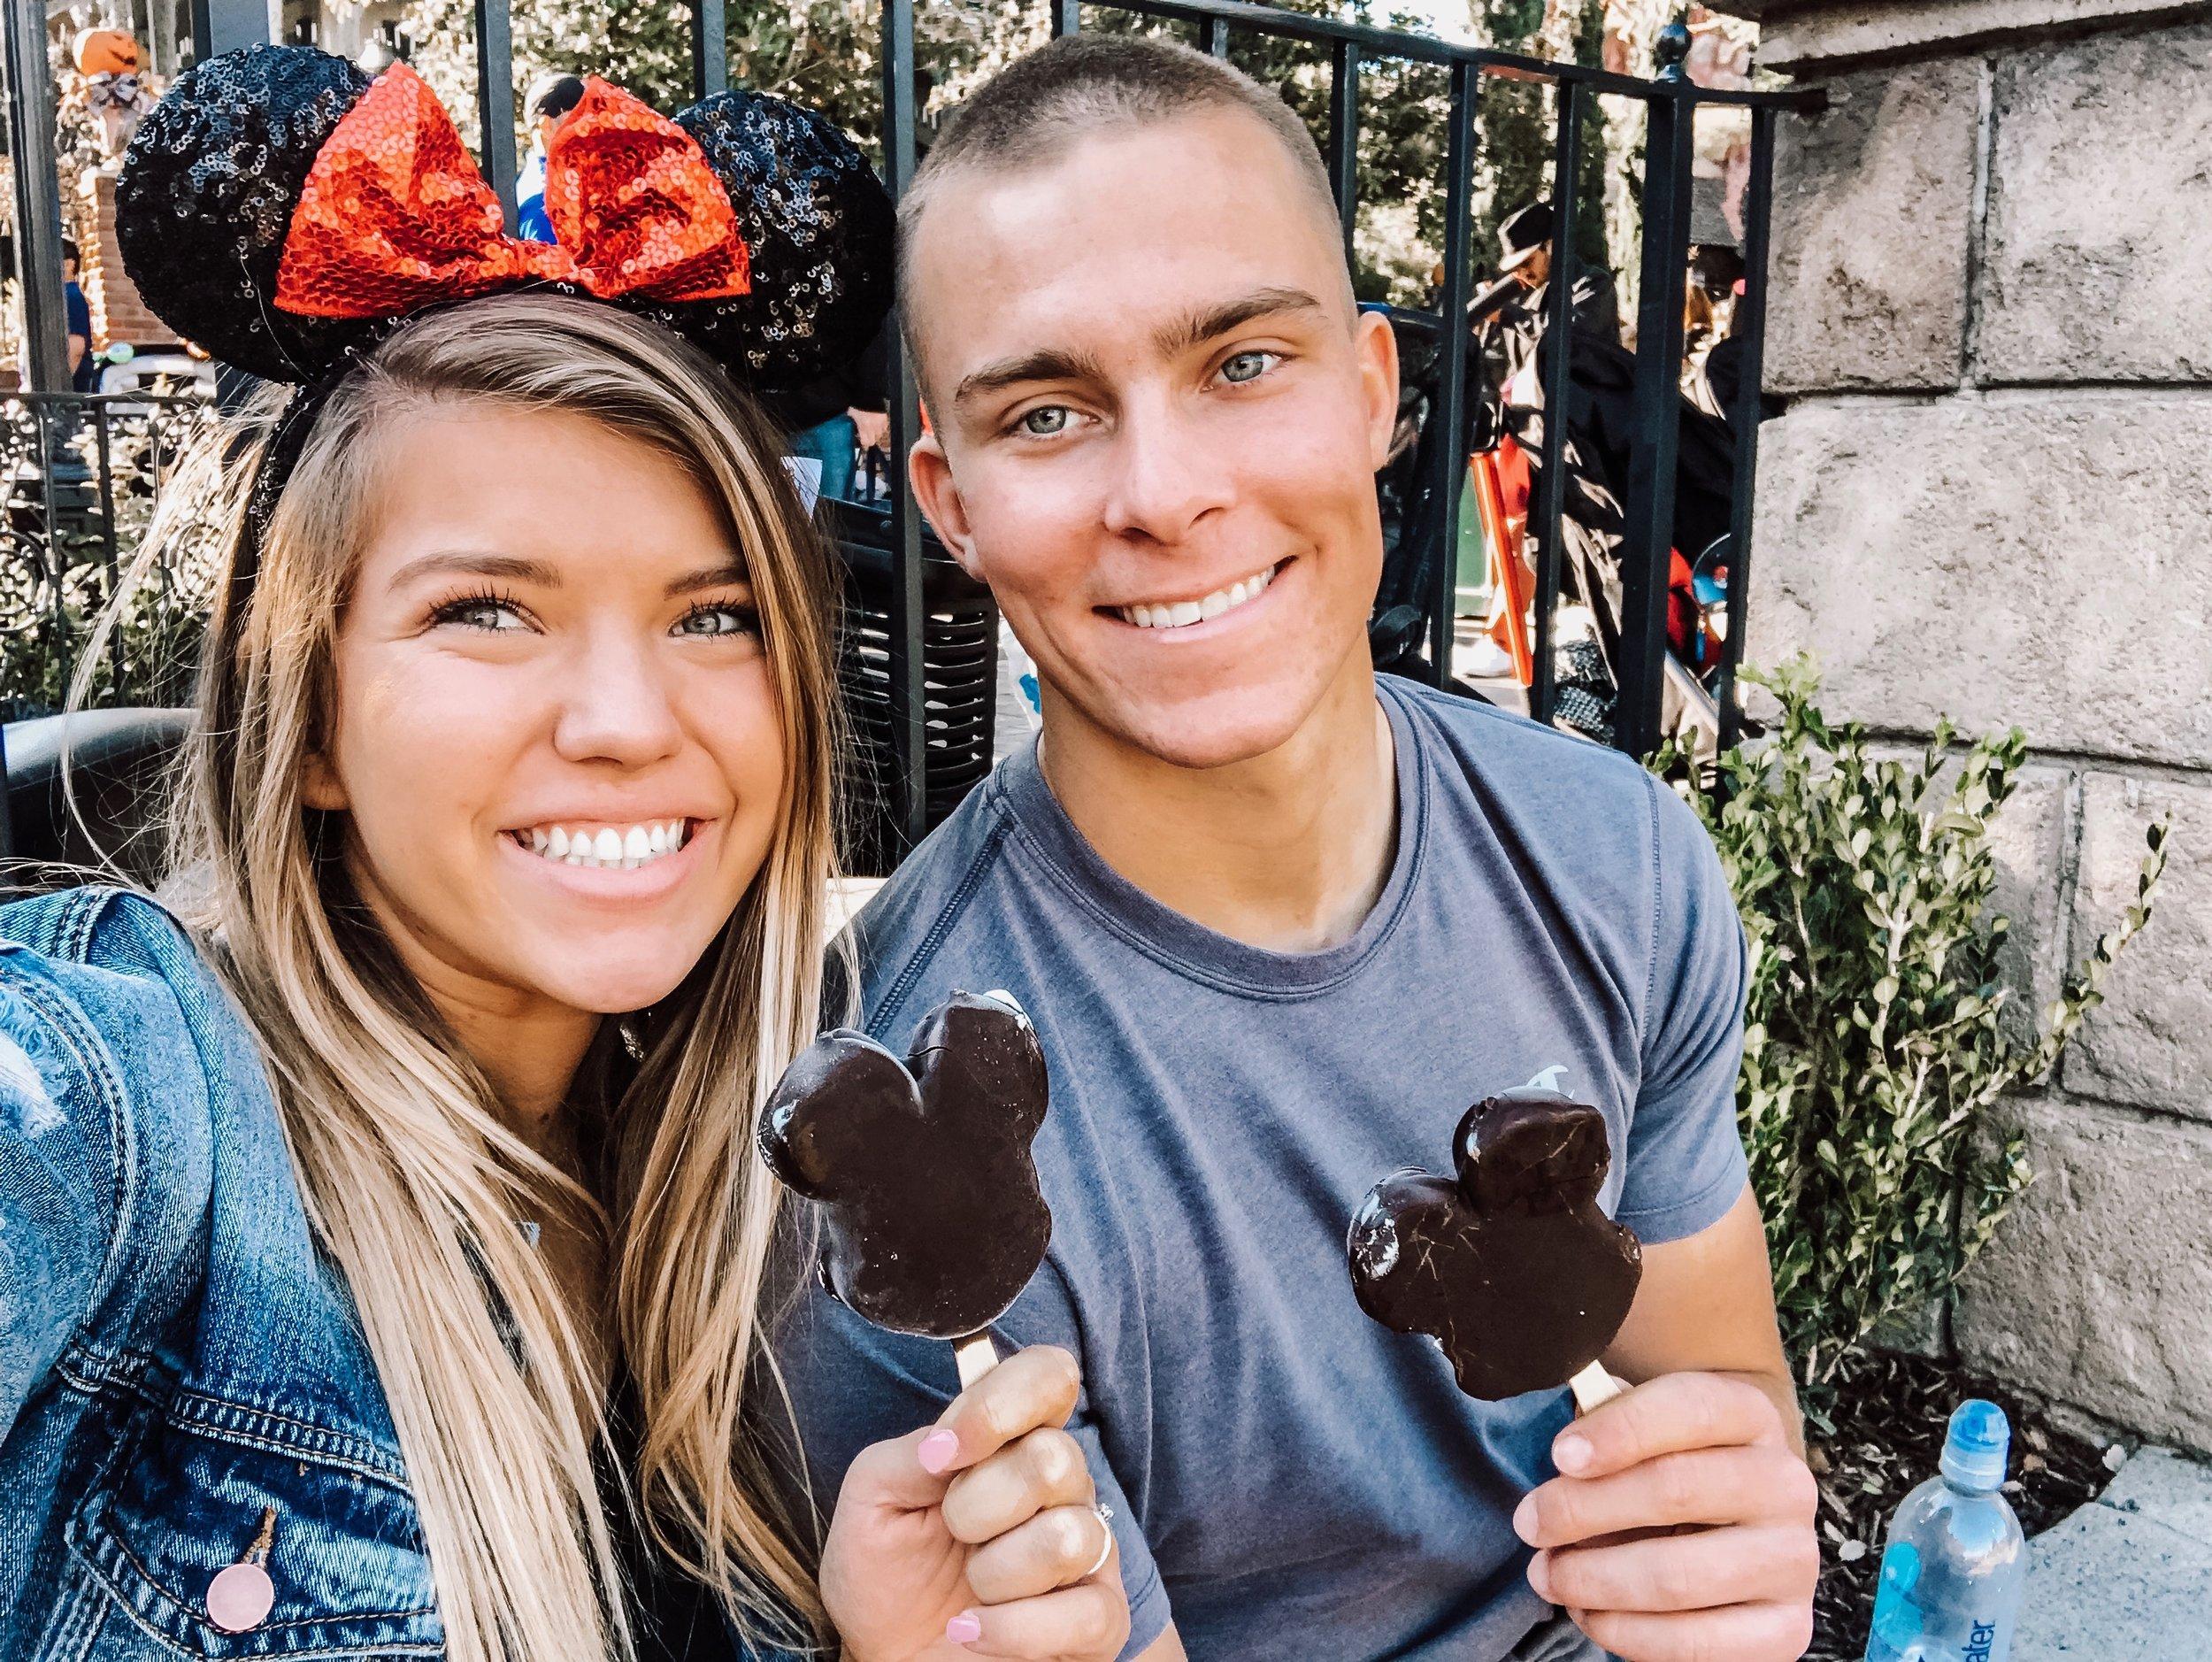 Mickey Shaped Ice Cream.jpg